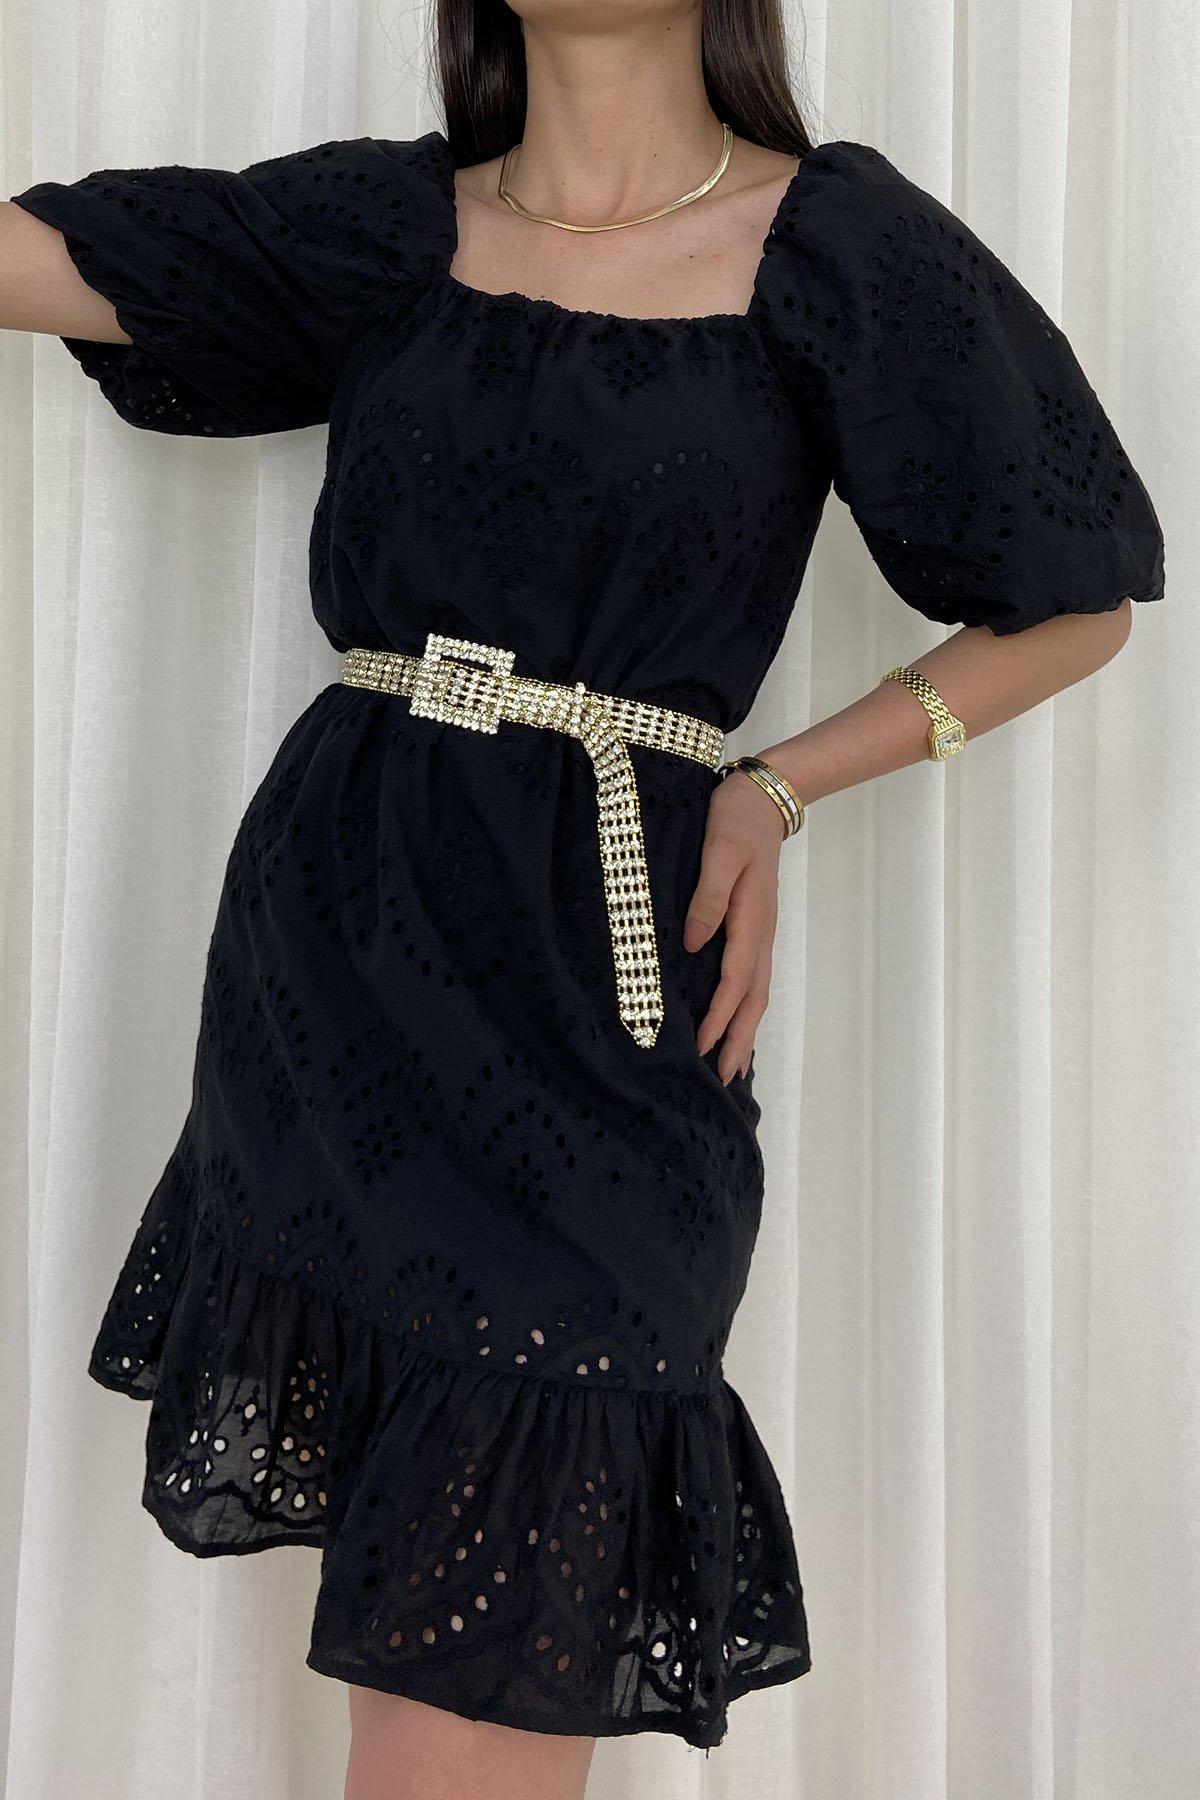 175 810 Karpuz Kol Fisto Elbise